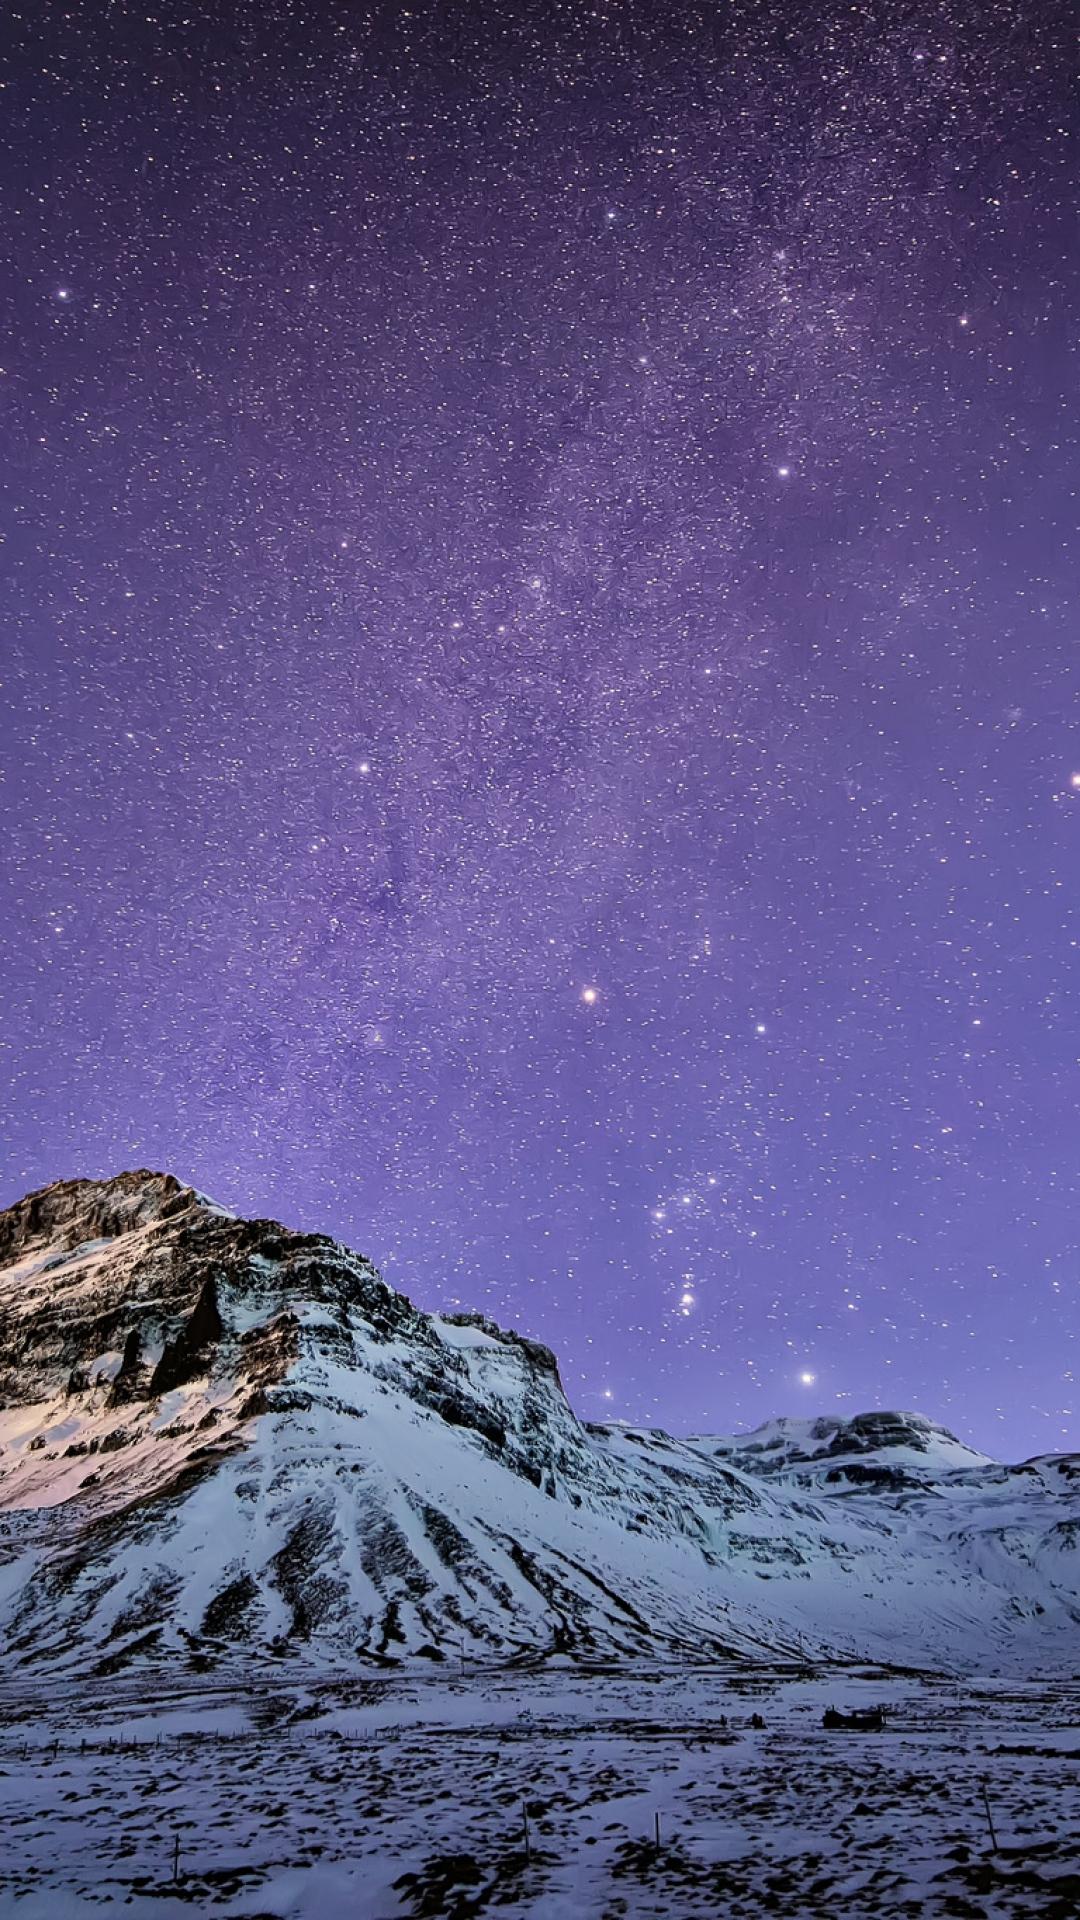 Snow-Mountain-Stars-Wallpaper-iPhone-6-Plus.jpg